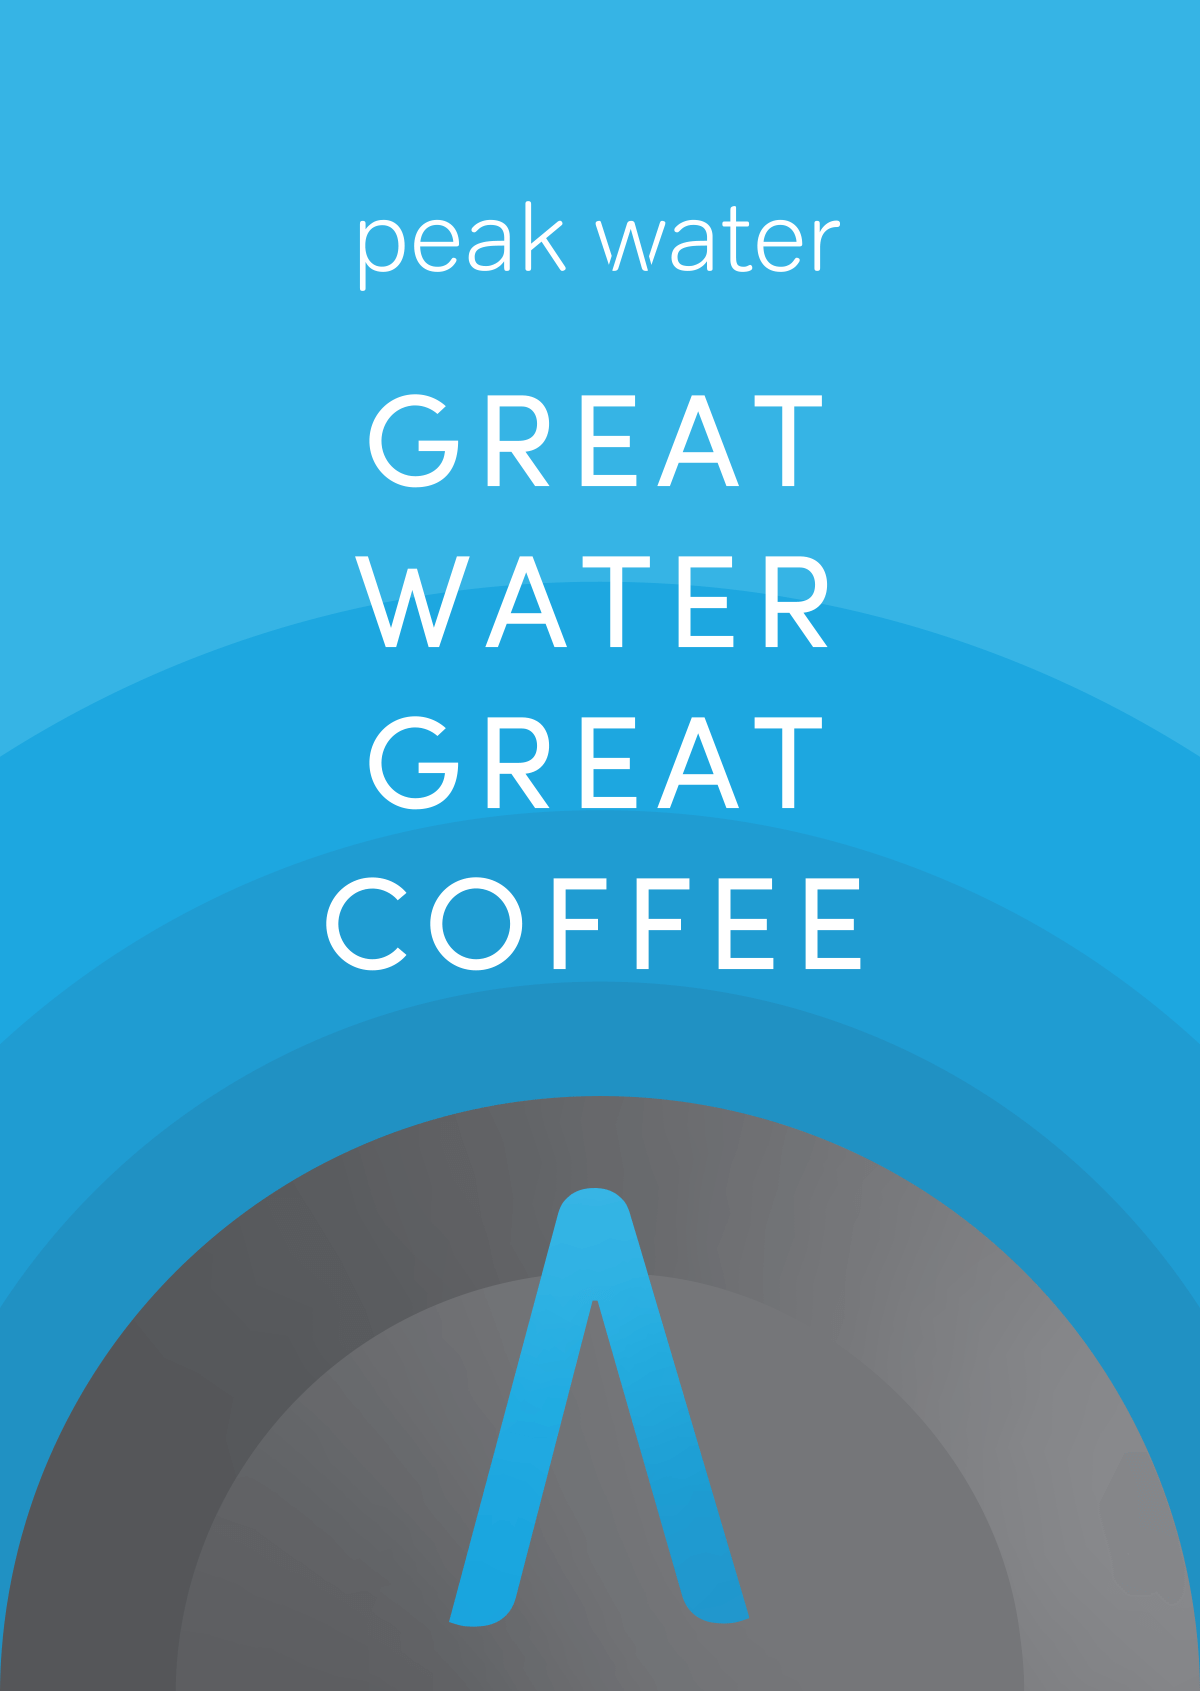 An early Peak Water postcard design